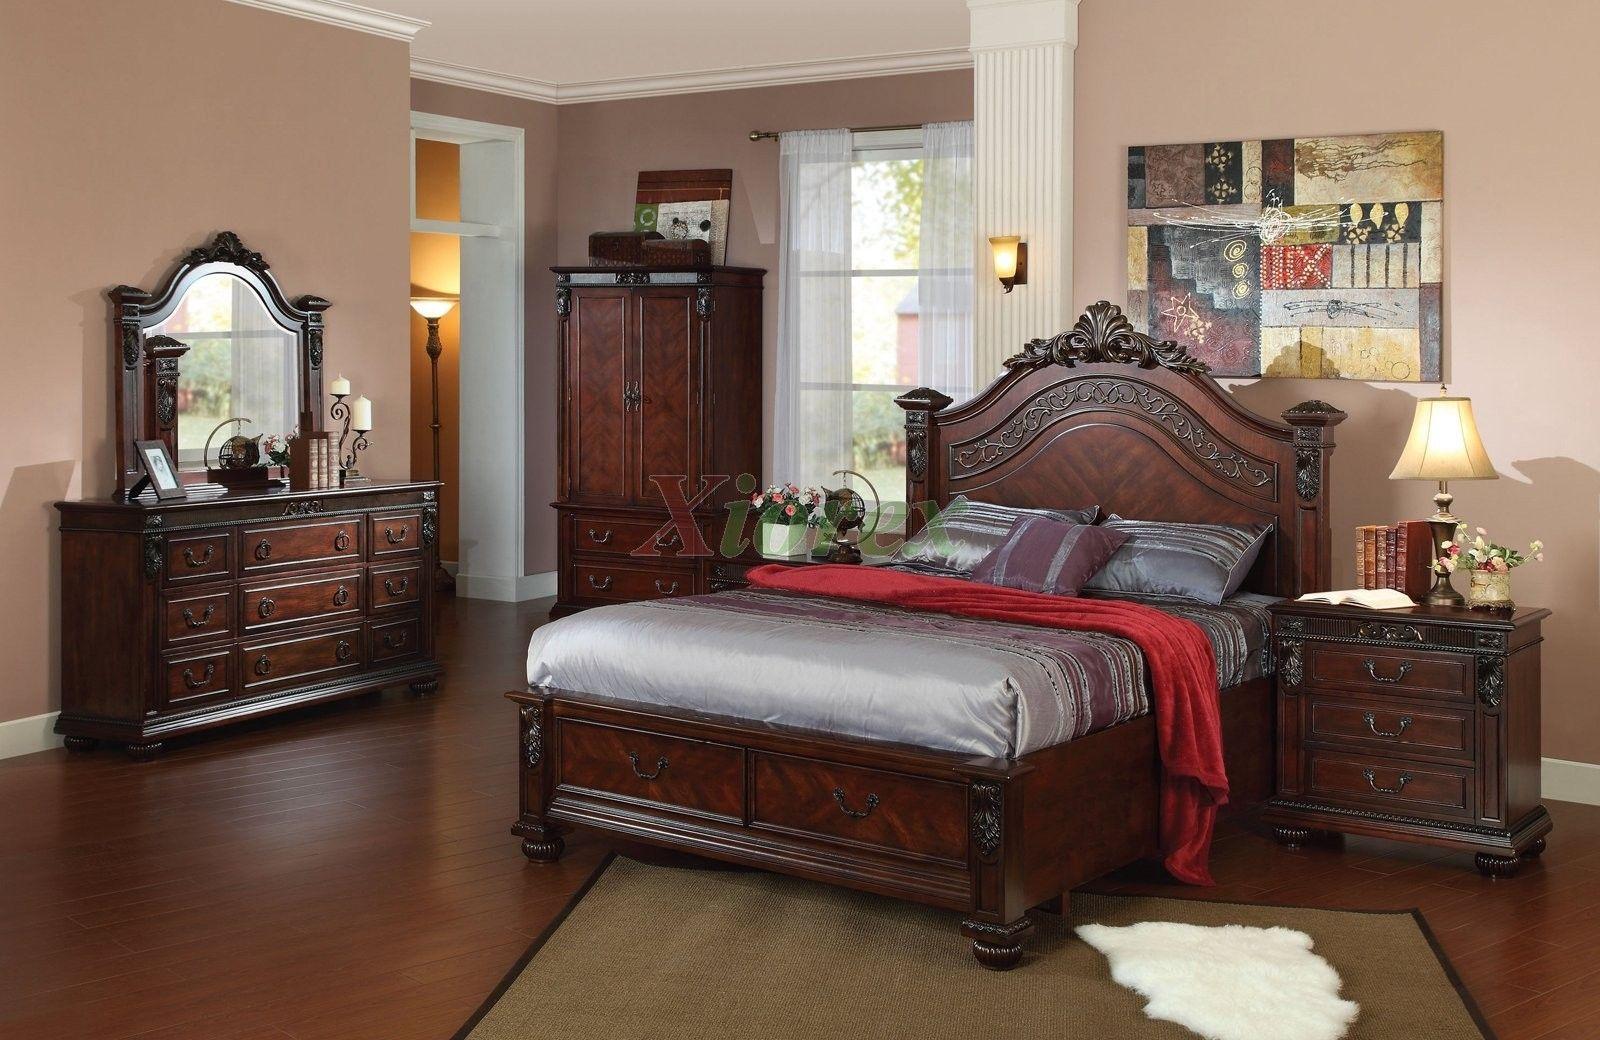 Queen bed furniture set queen bed furniture set bedroom furniture